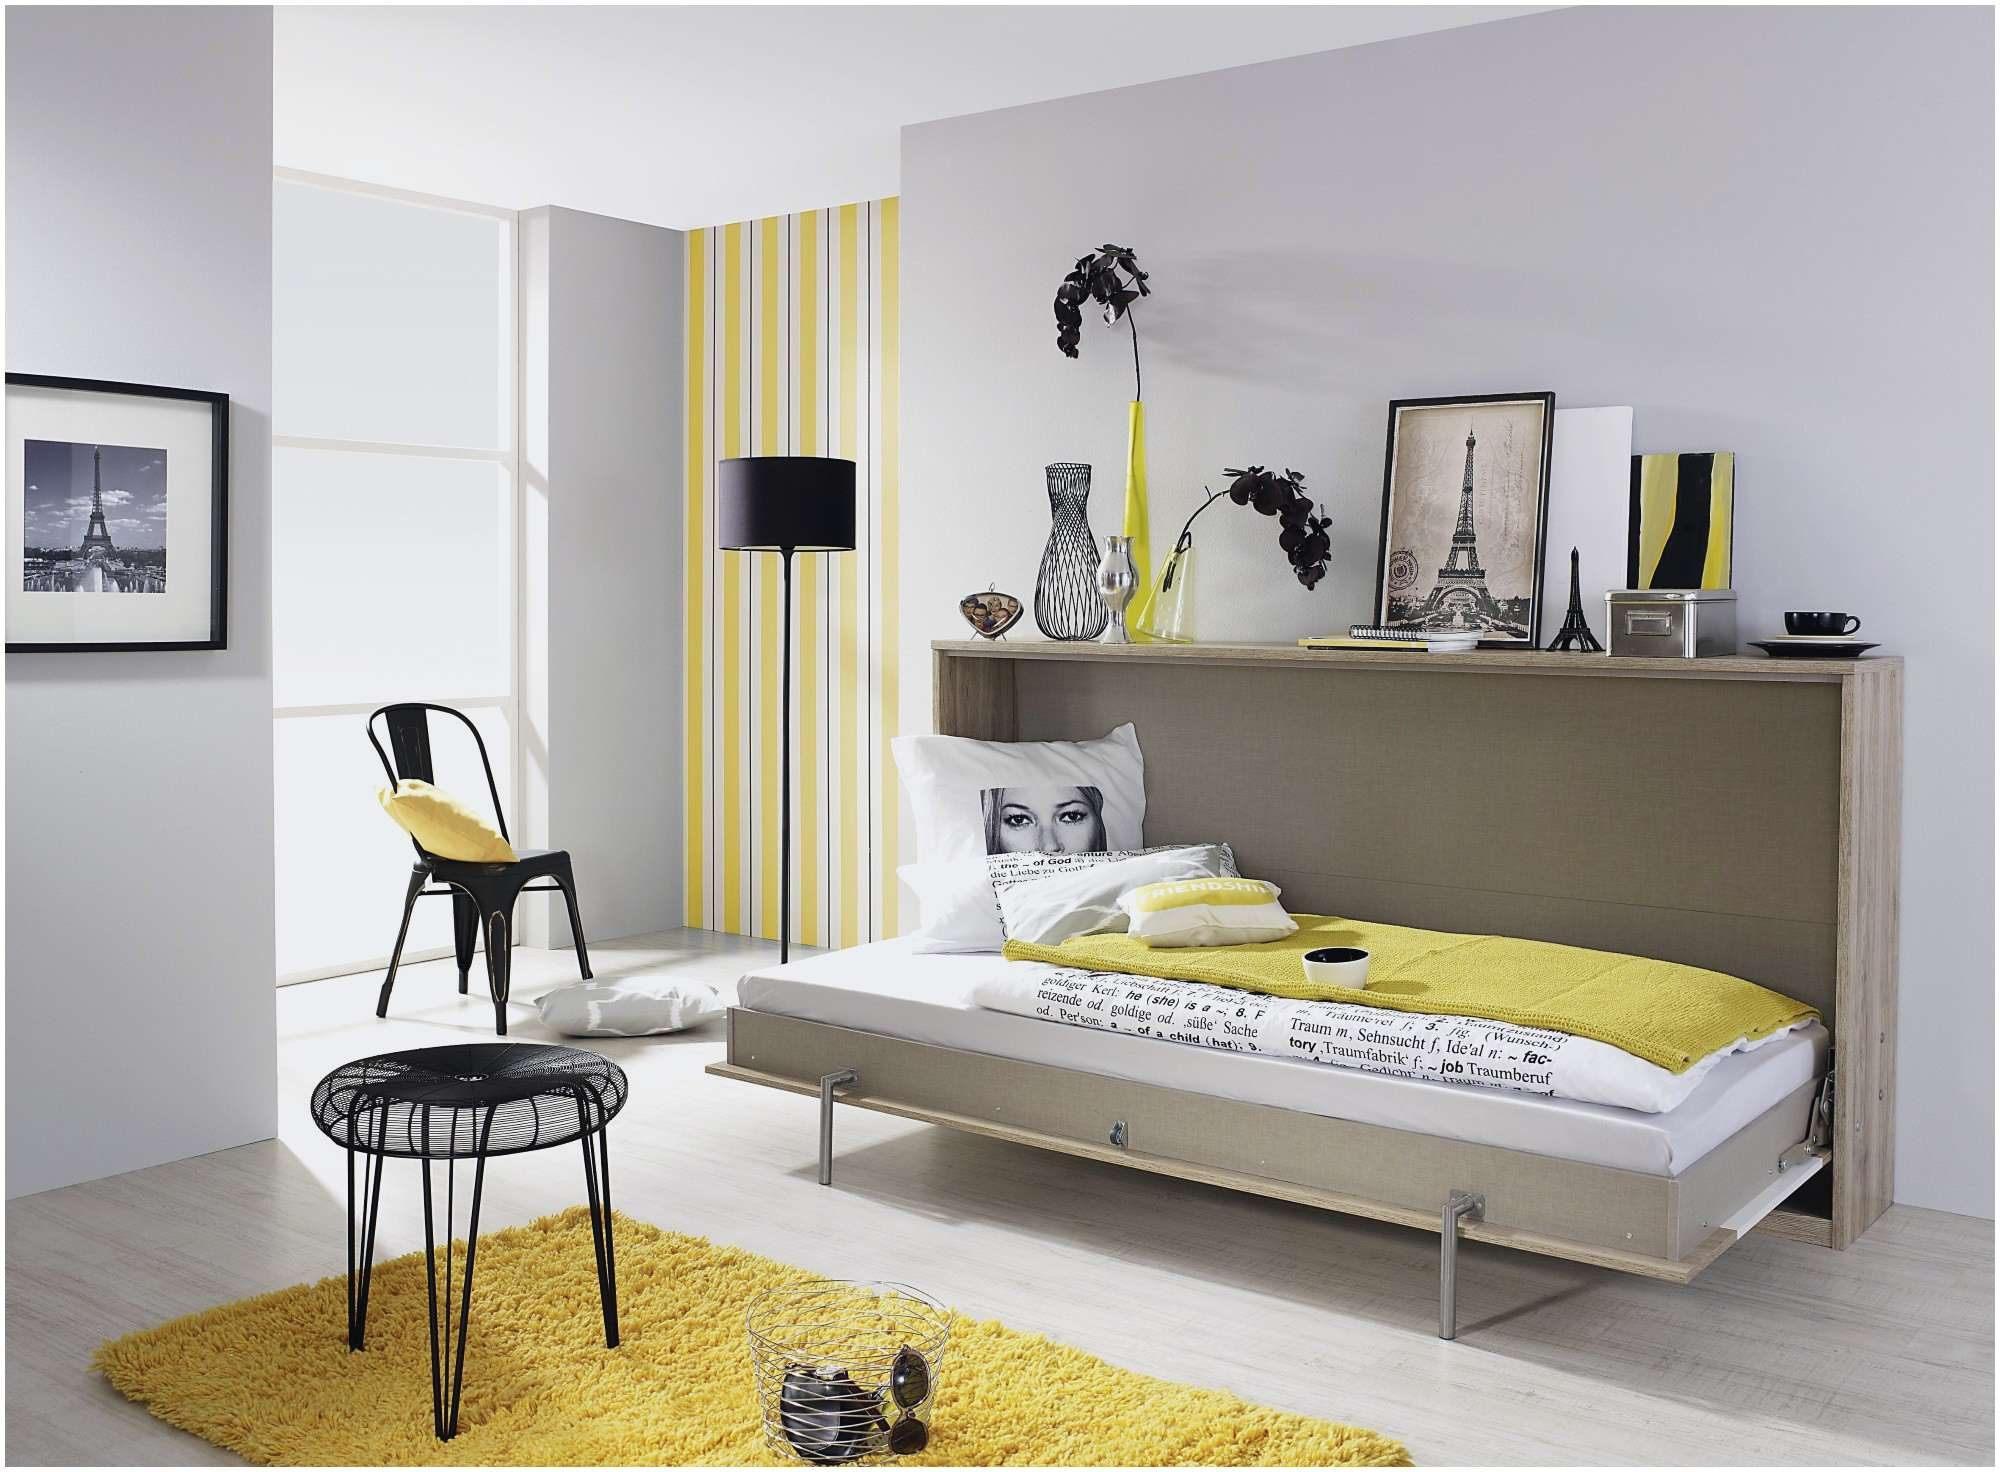 Lit Escamotable Ikea Bel Le Meilleur De Armoir Lit Ikea Chambre Adulte Ikea Génial Ikea